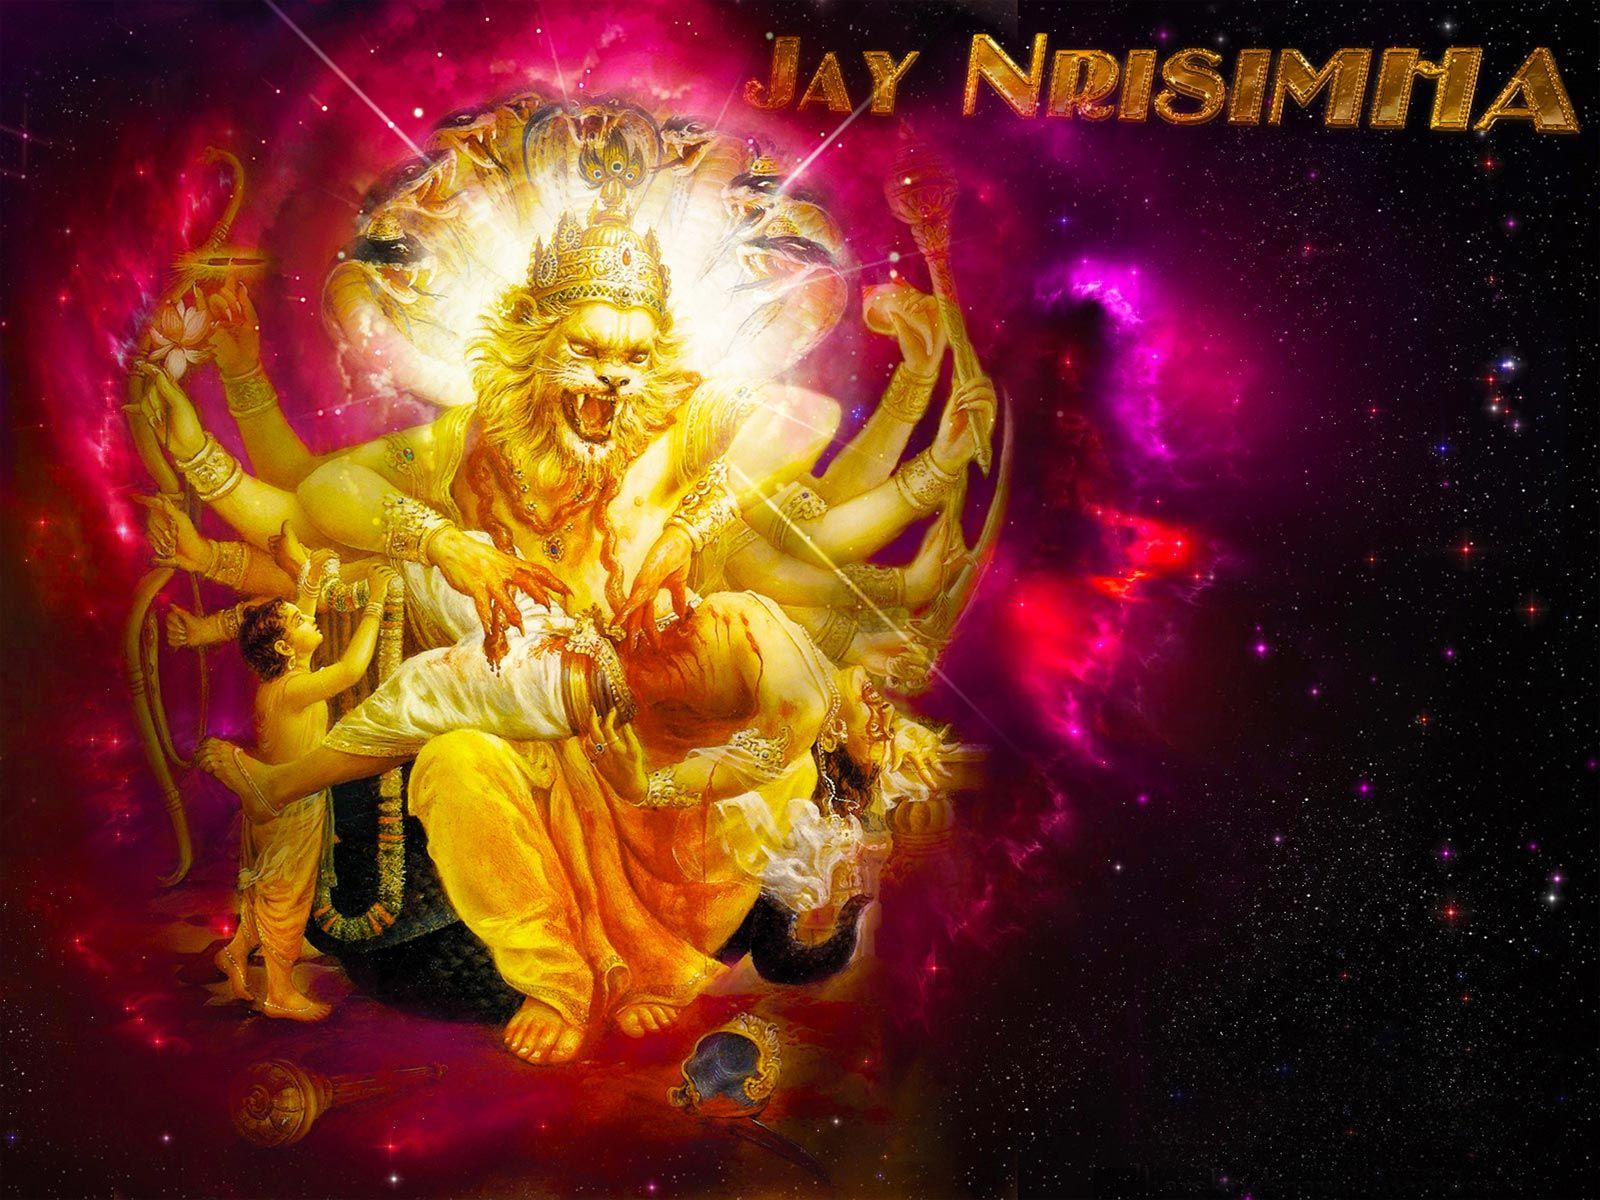 Lord Narasimha - HD Wallpaper